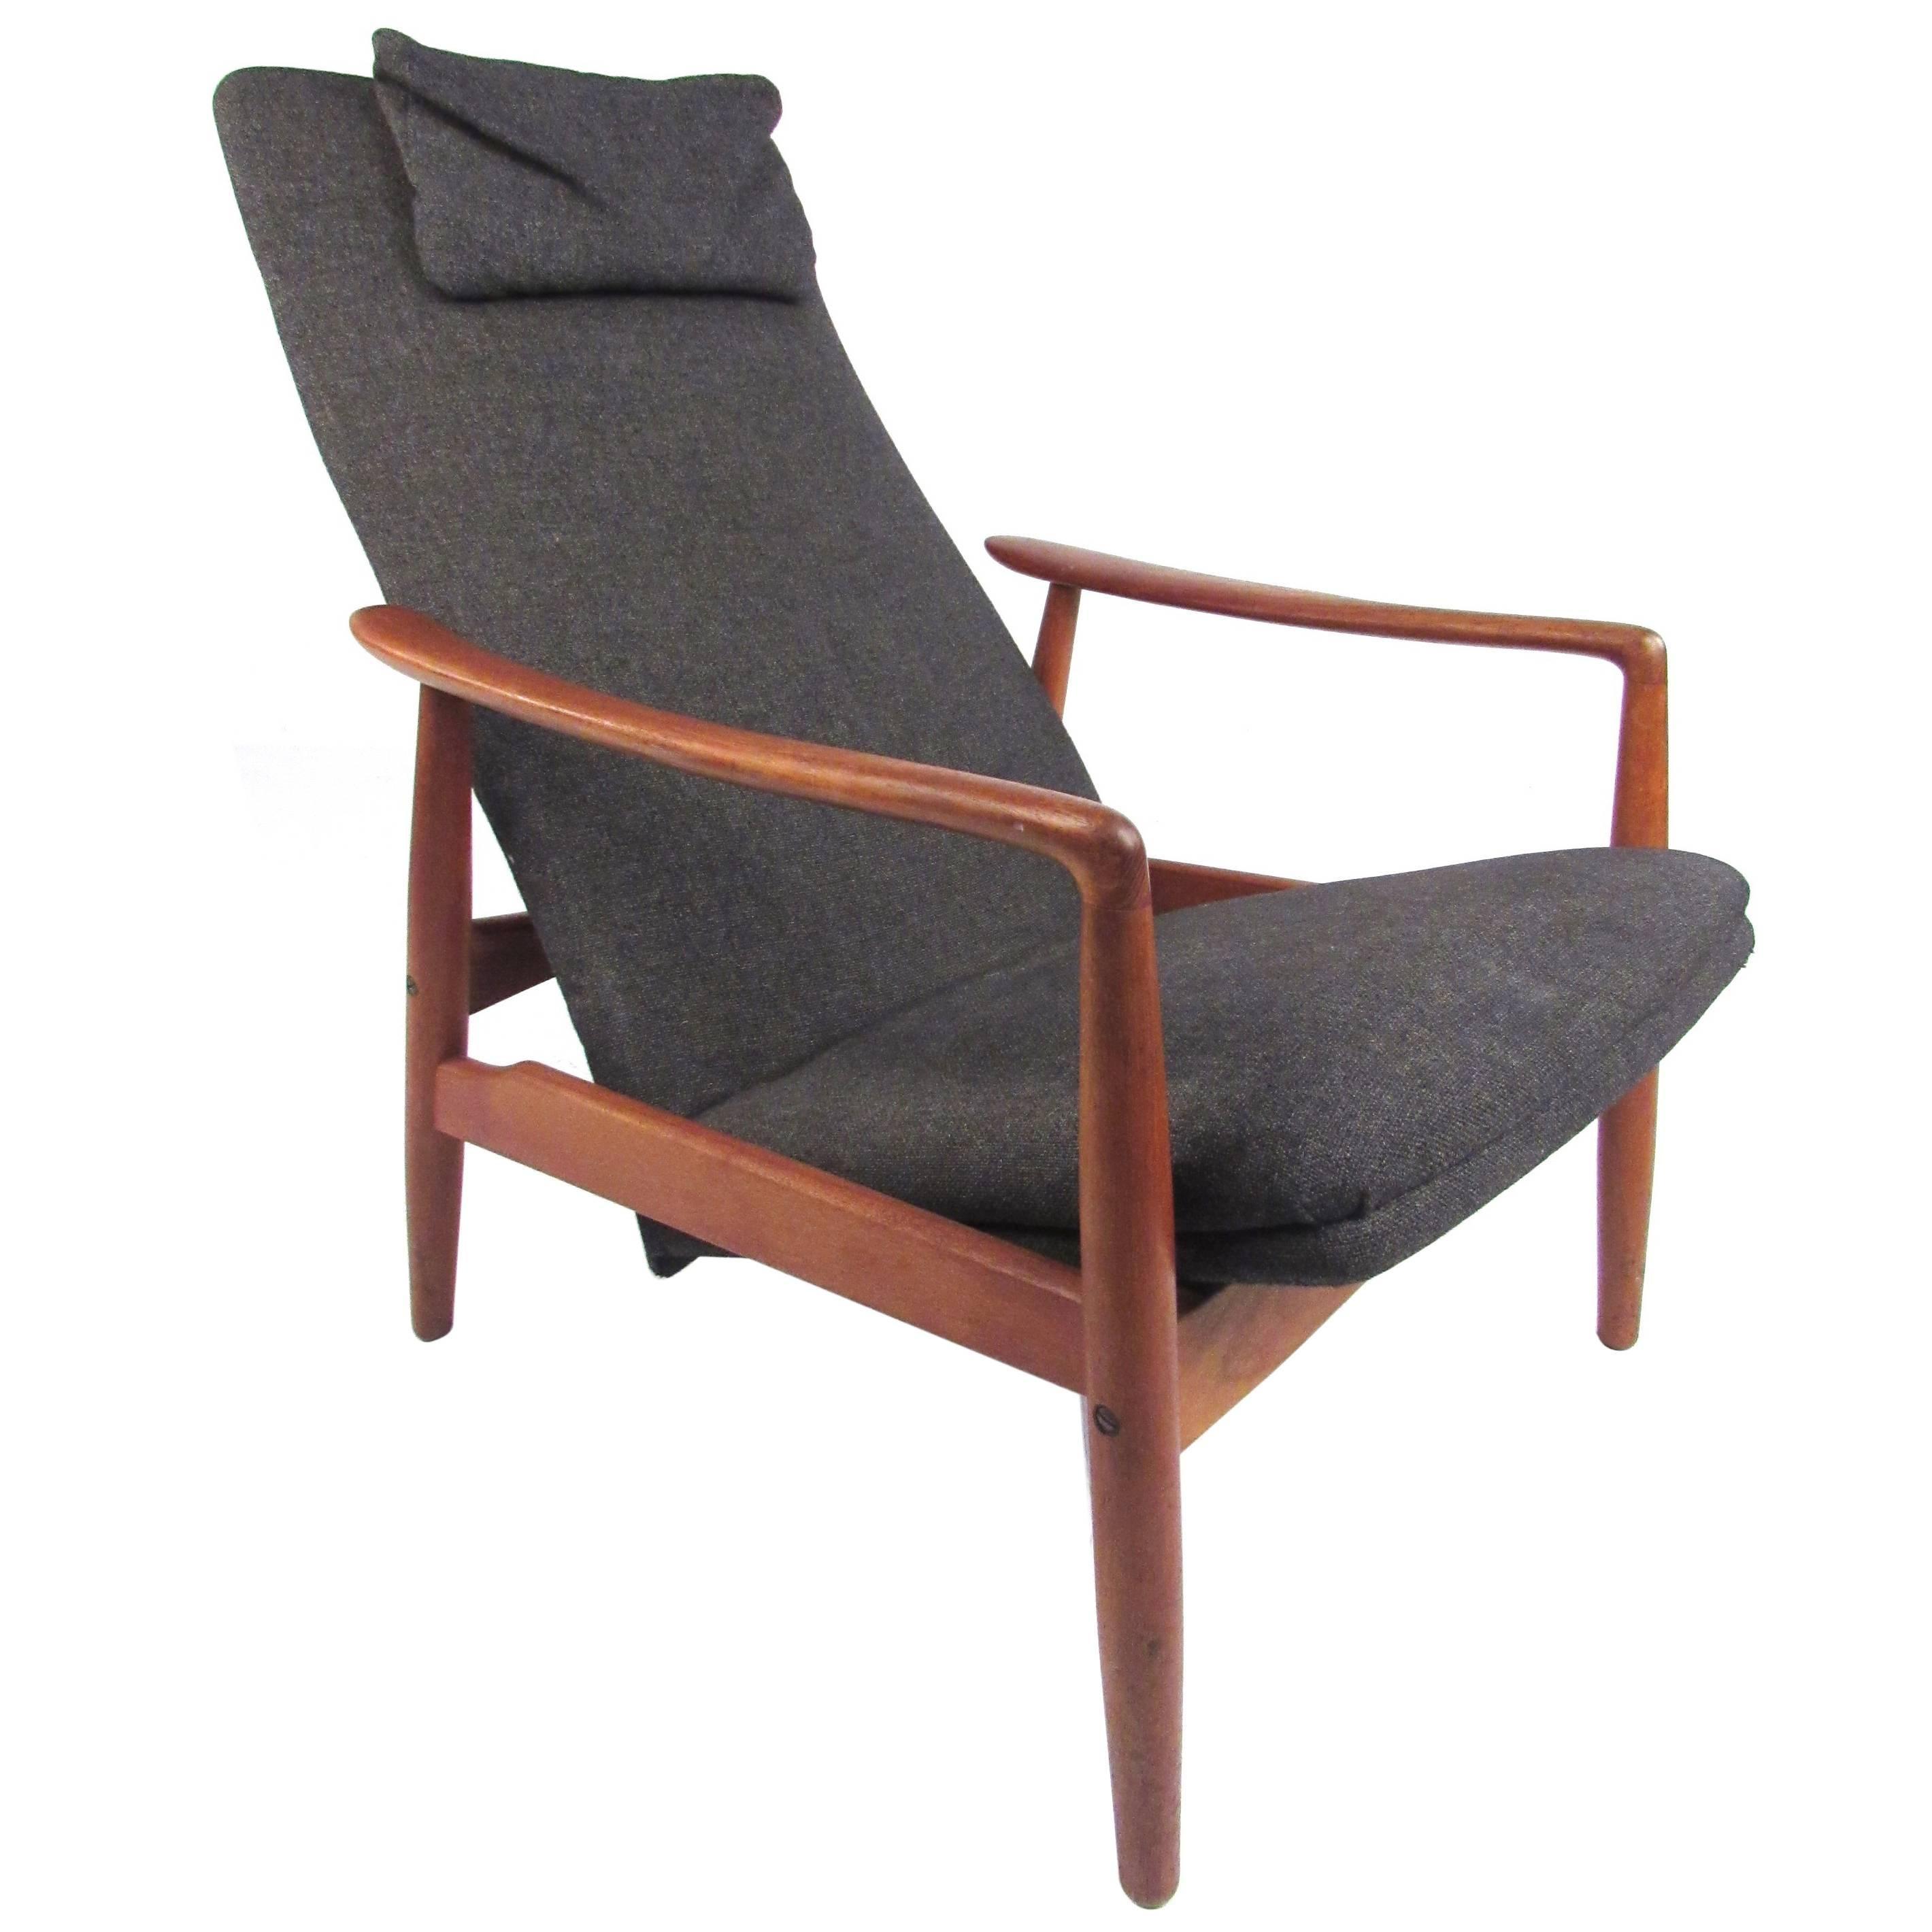 Scandinavian Modern Teak High Back Lounge Chair